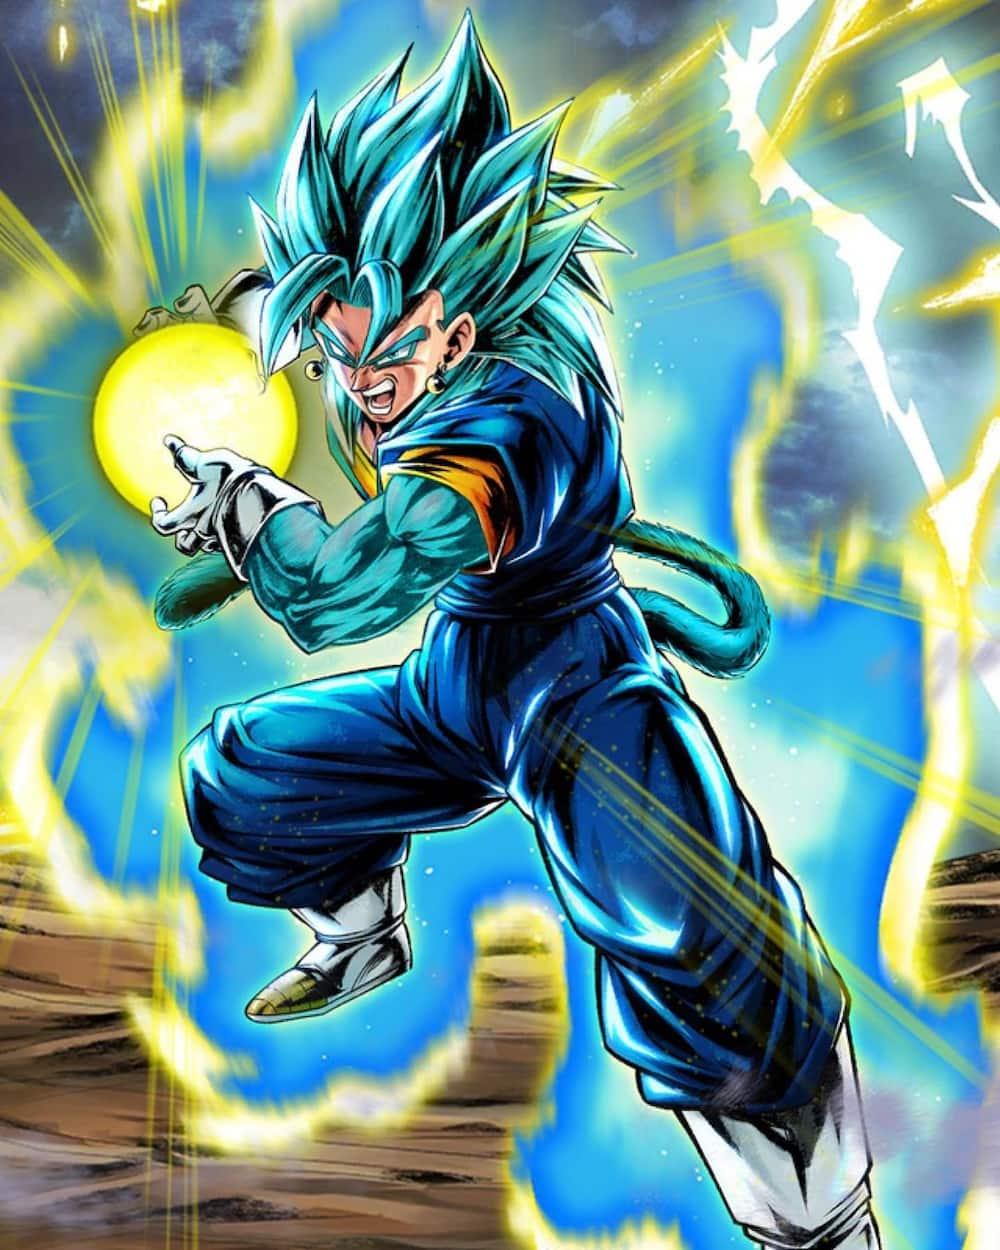 Goku games